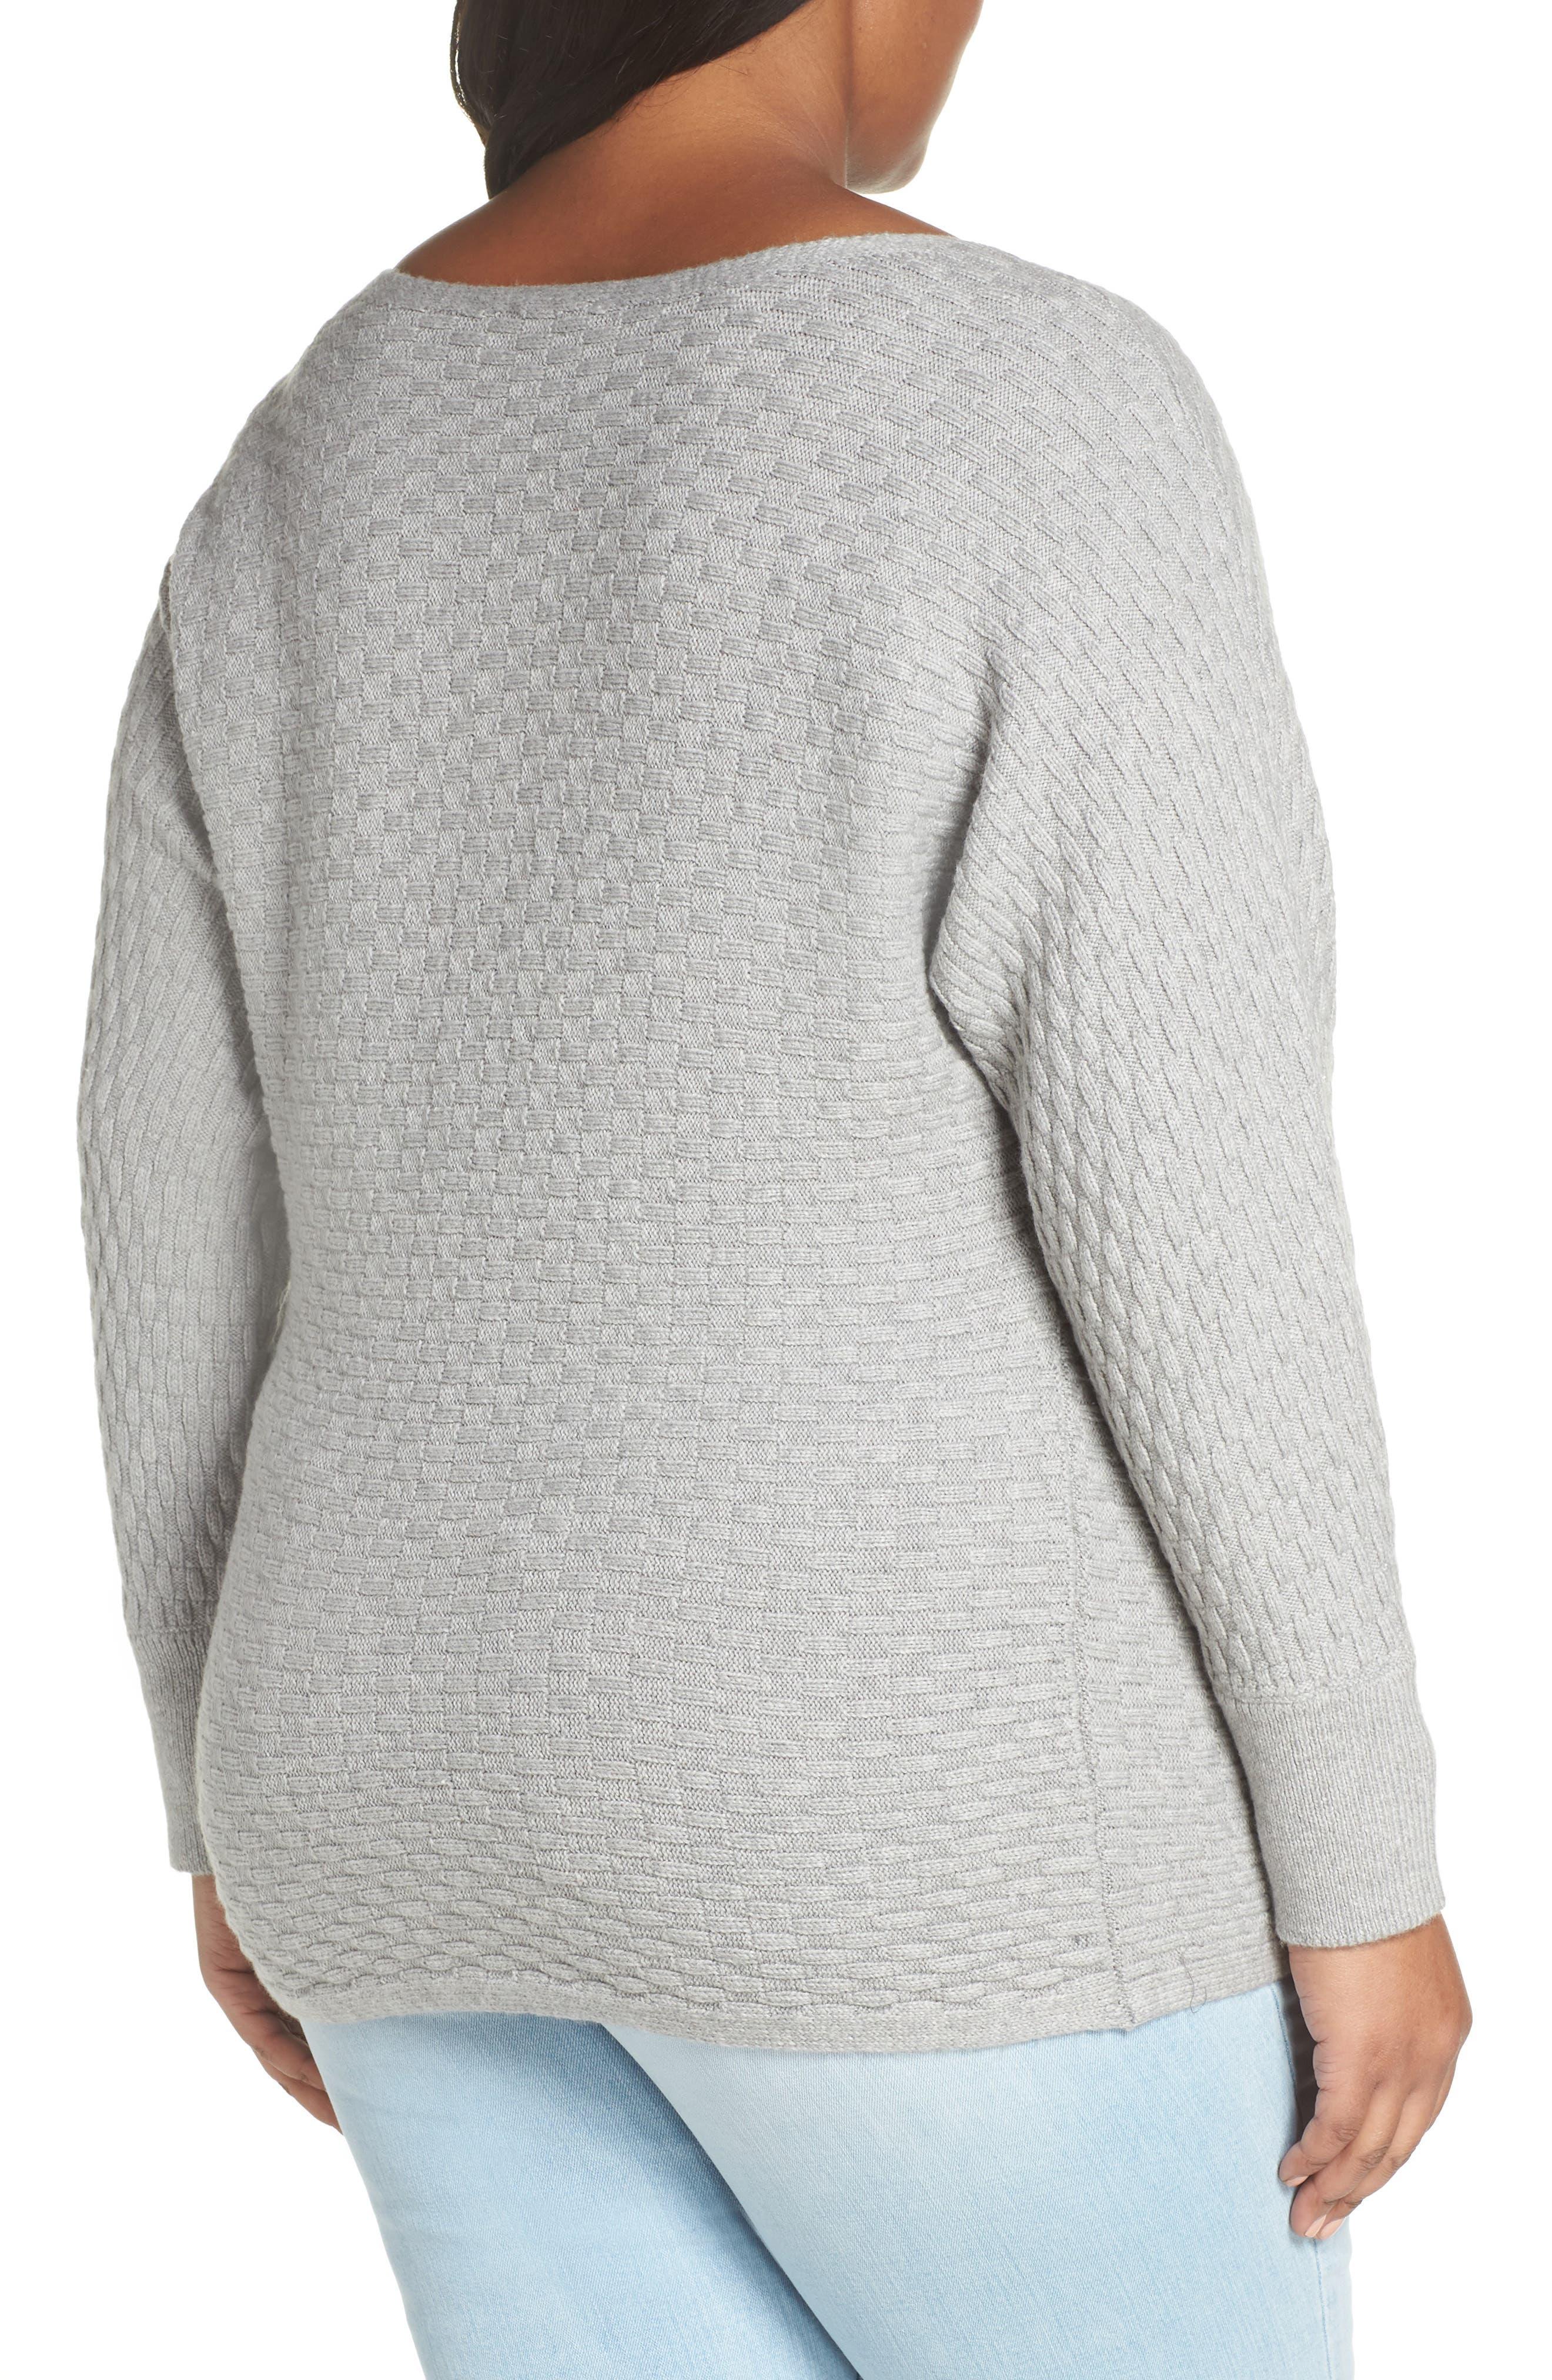 Boatneck Sweater,                             Alternate thumbnail 2, color,                             LIGHT HEATHER GREY